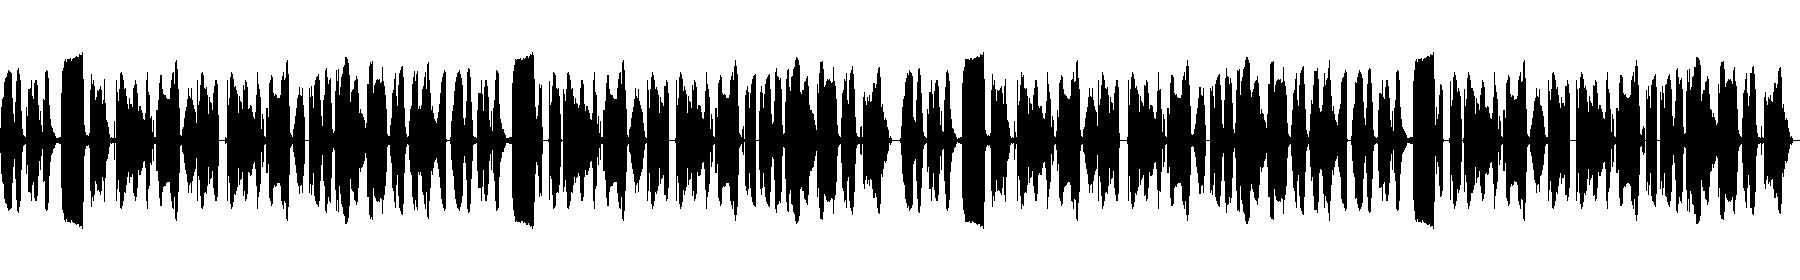 ebmin 94bpm vox